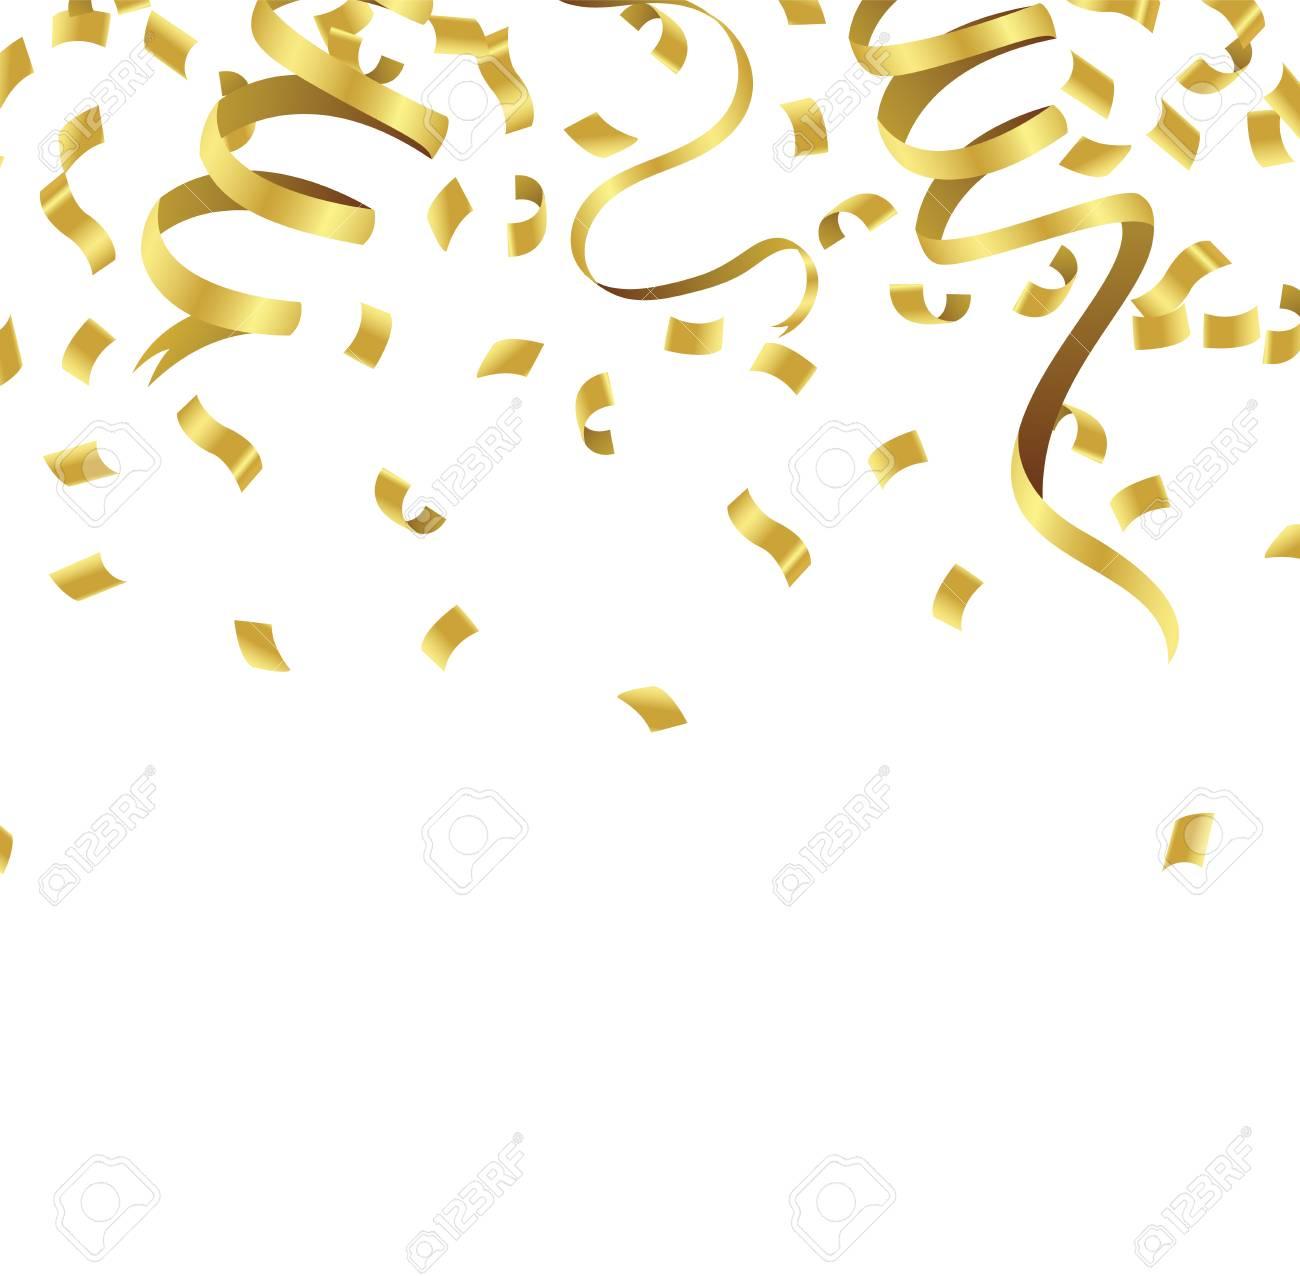 Stock vector illustration defocused gold confetti isolated on...